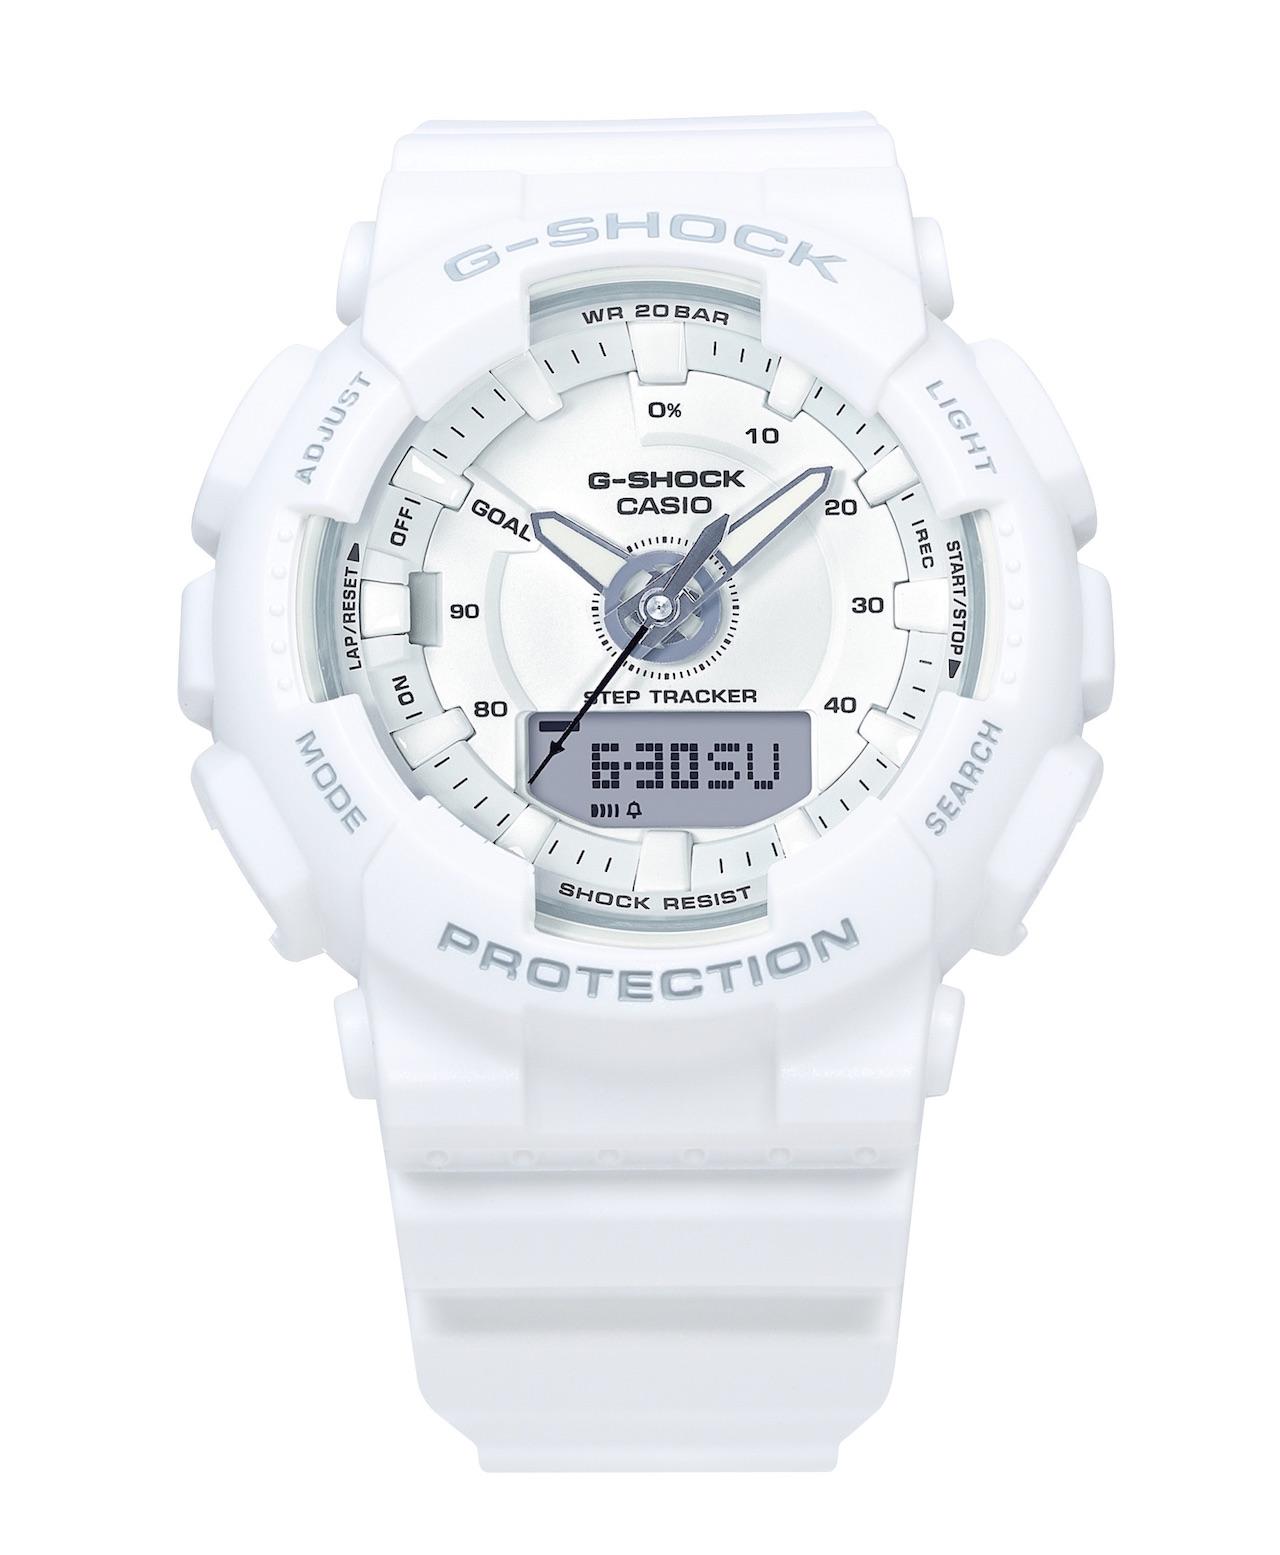 The watch has a digital step tracker